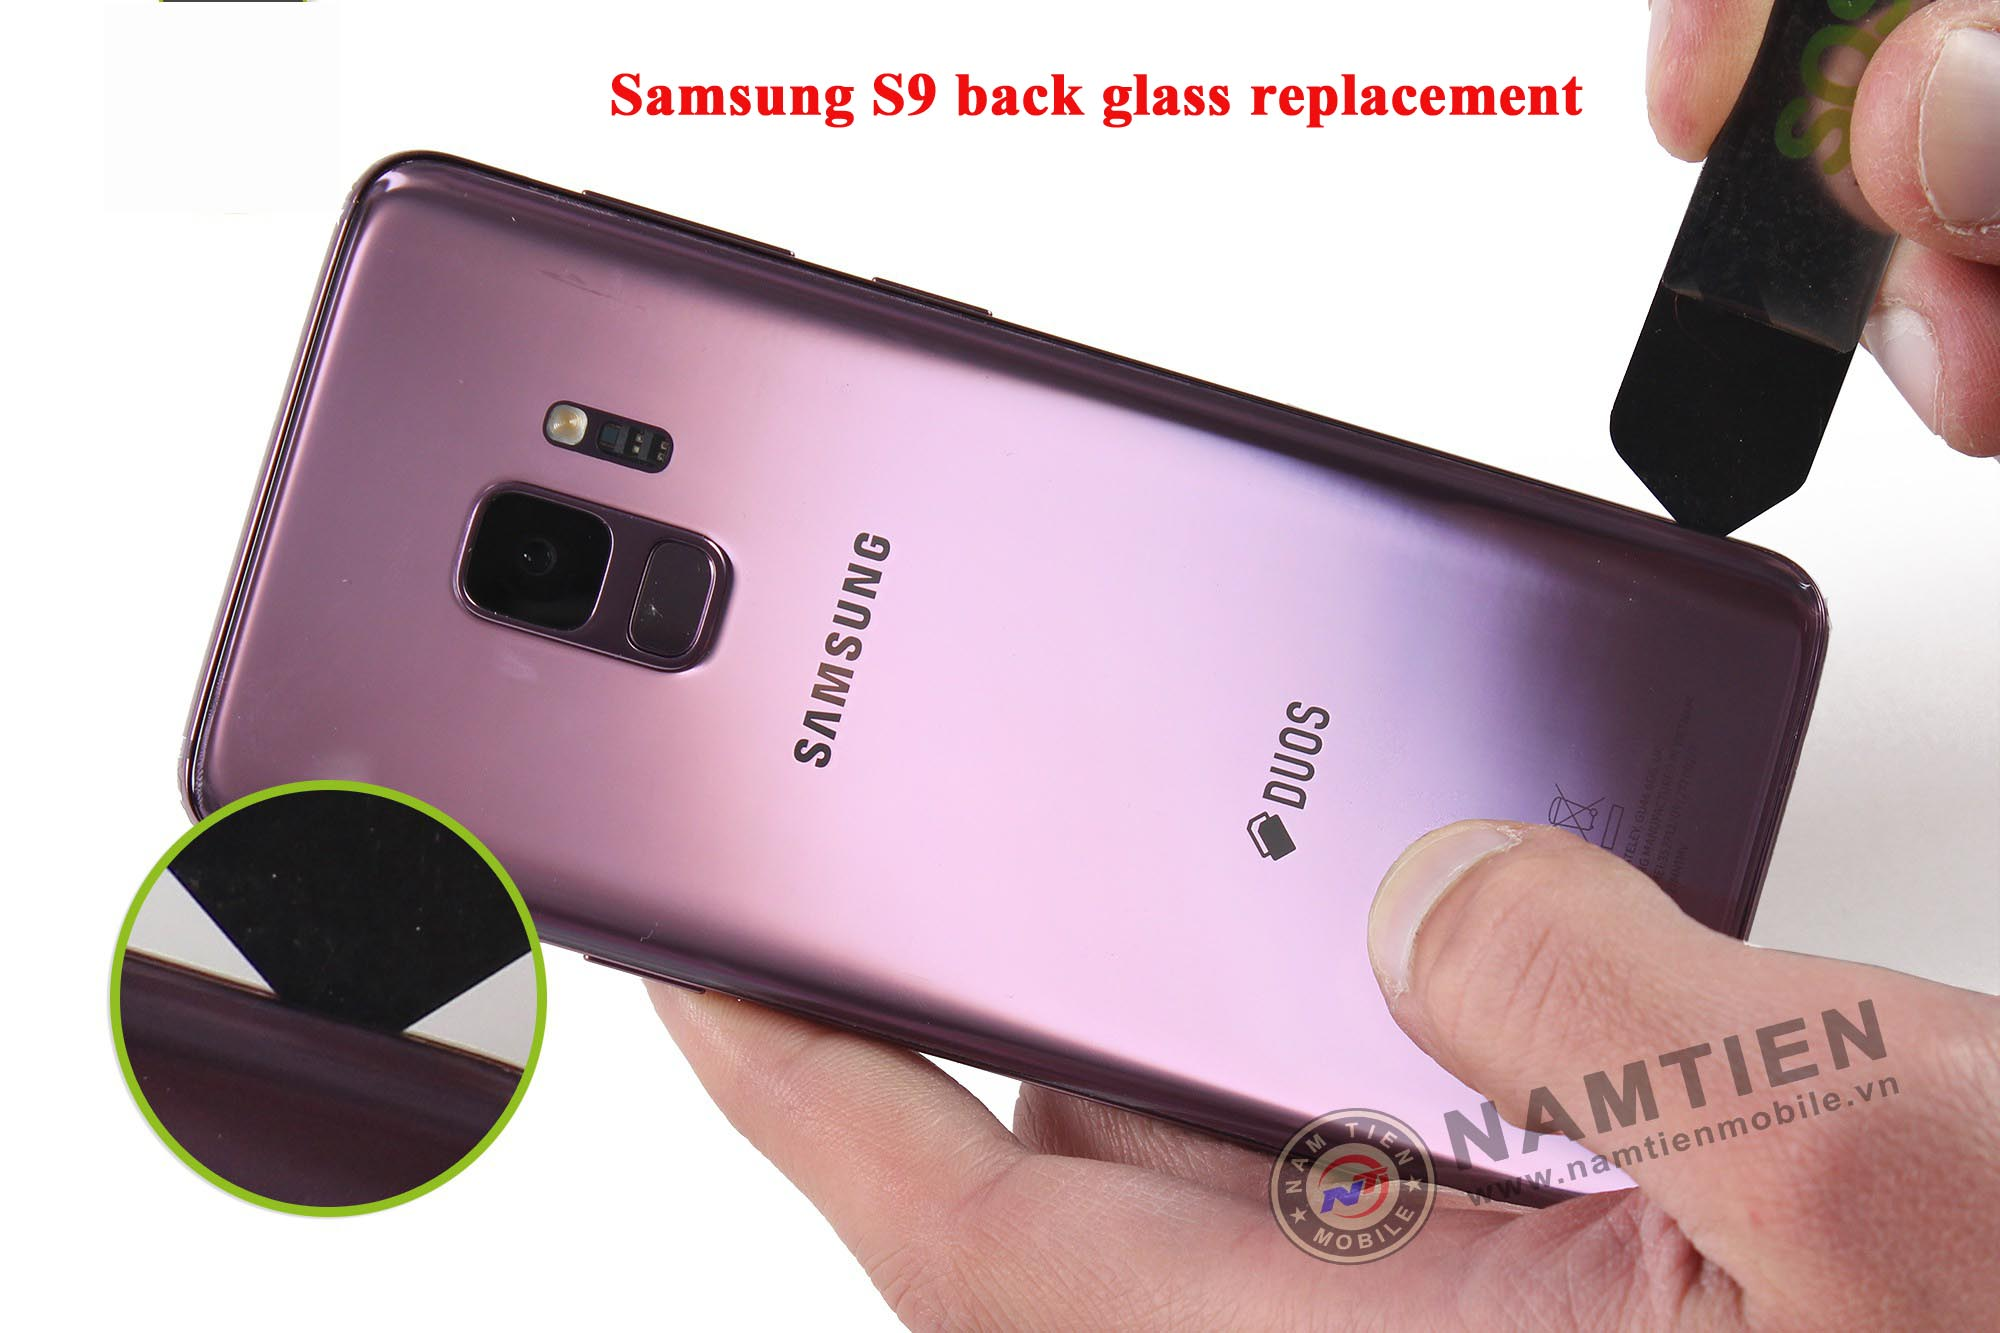 Thay mặt kính sau Samsung S9 giá rẻ